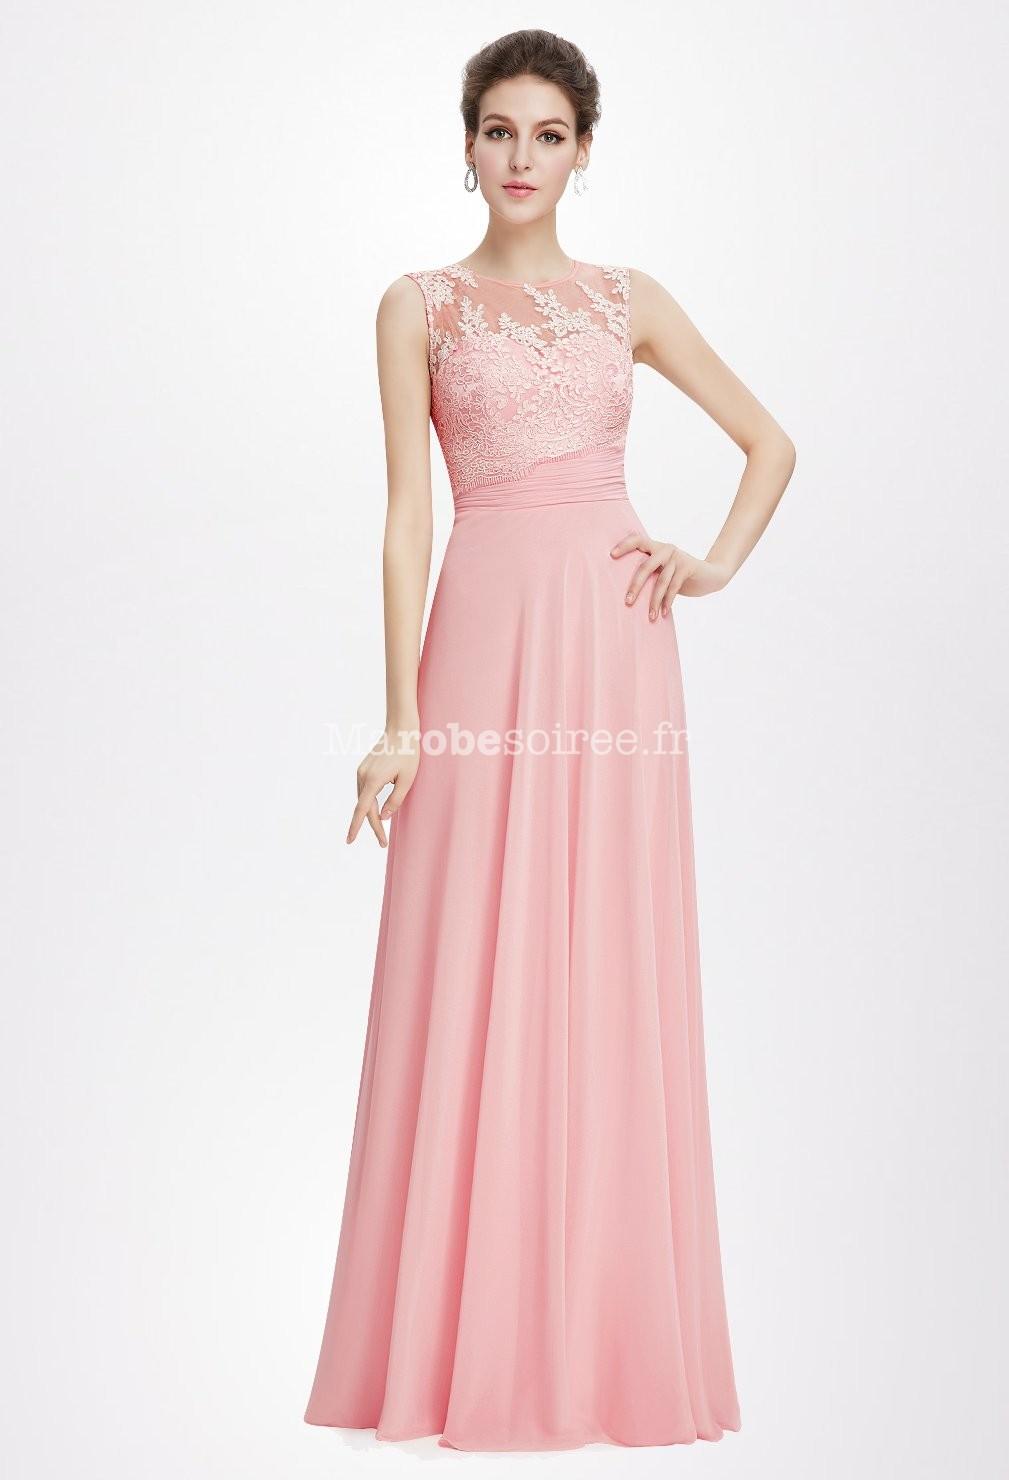 Robe de ceremonie dentelle rose